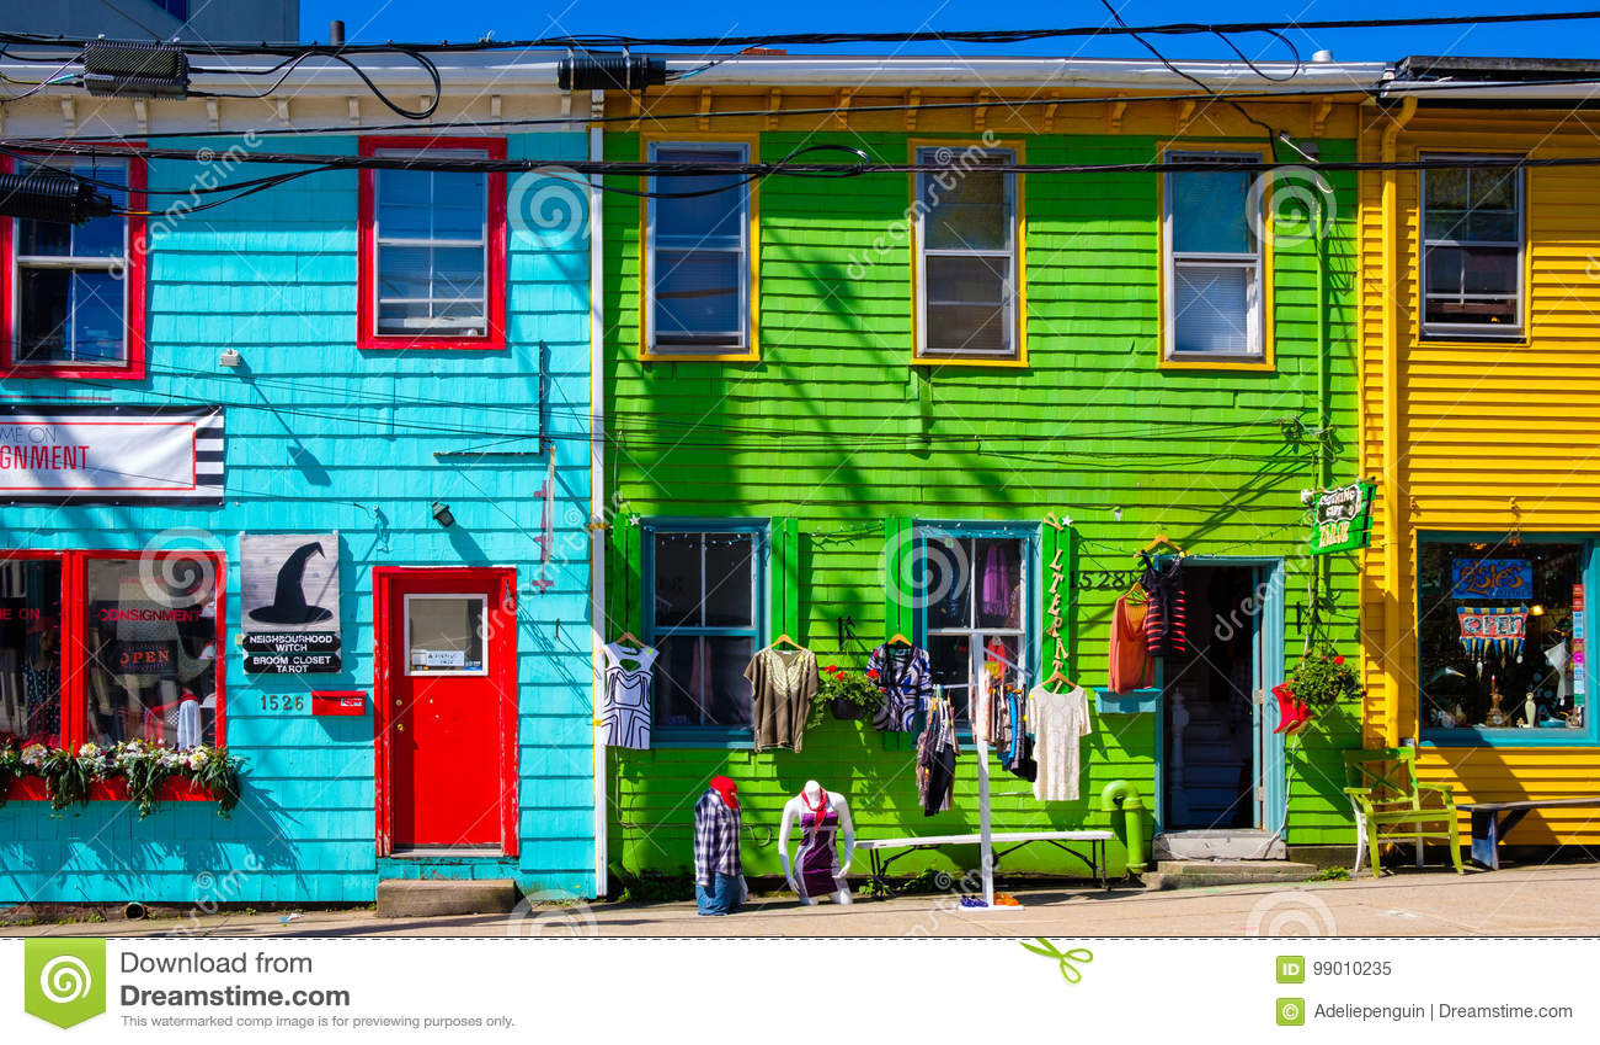 Colorful Street, Halifax, Nova Scotia, Canada